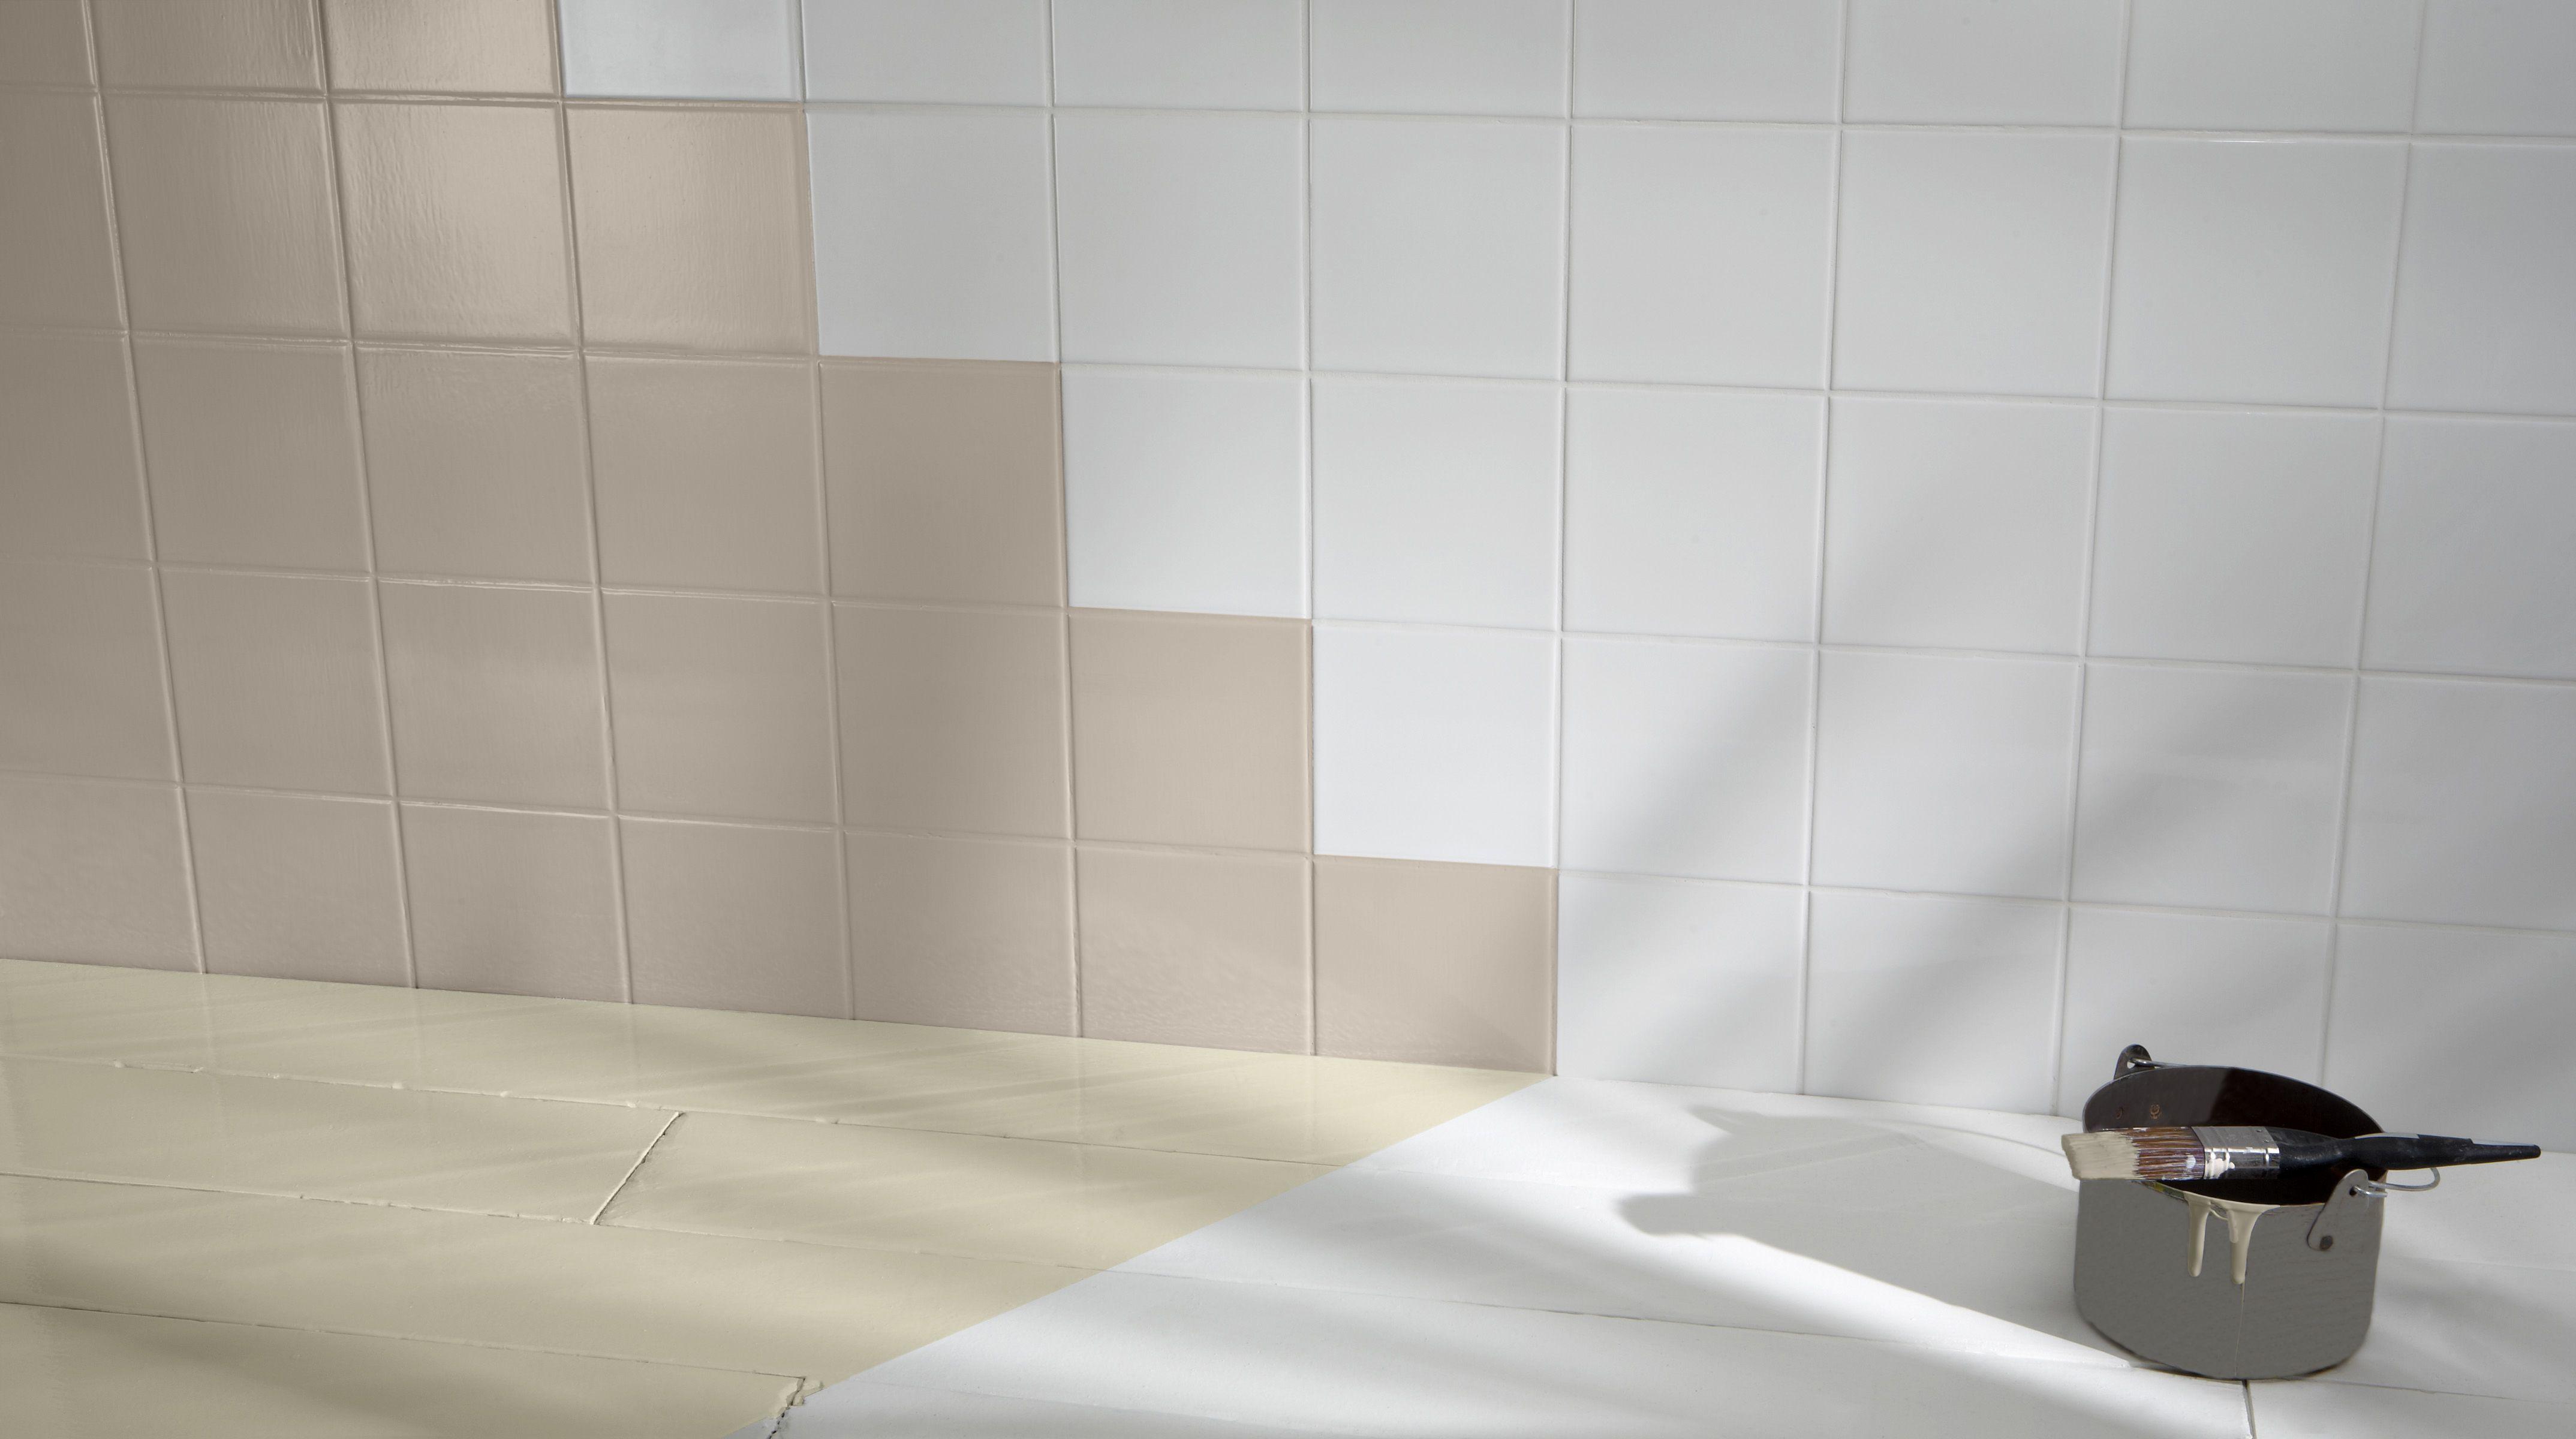 How To Paint Tiles Ideas Advice Diy At B Q